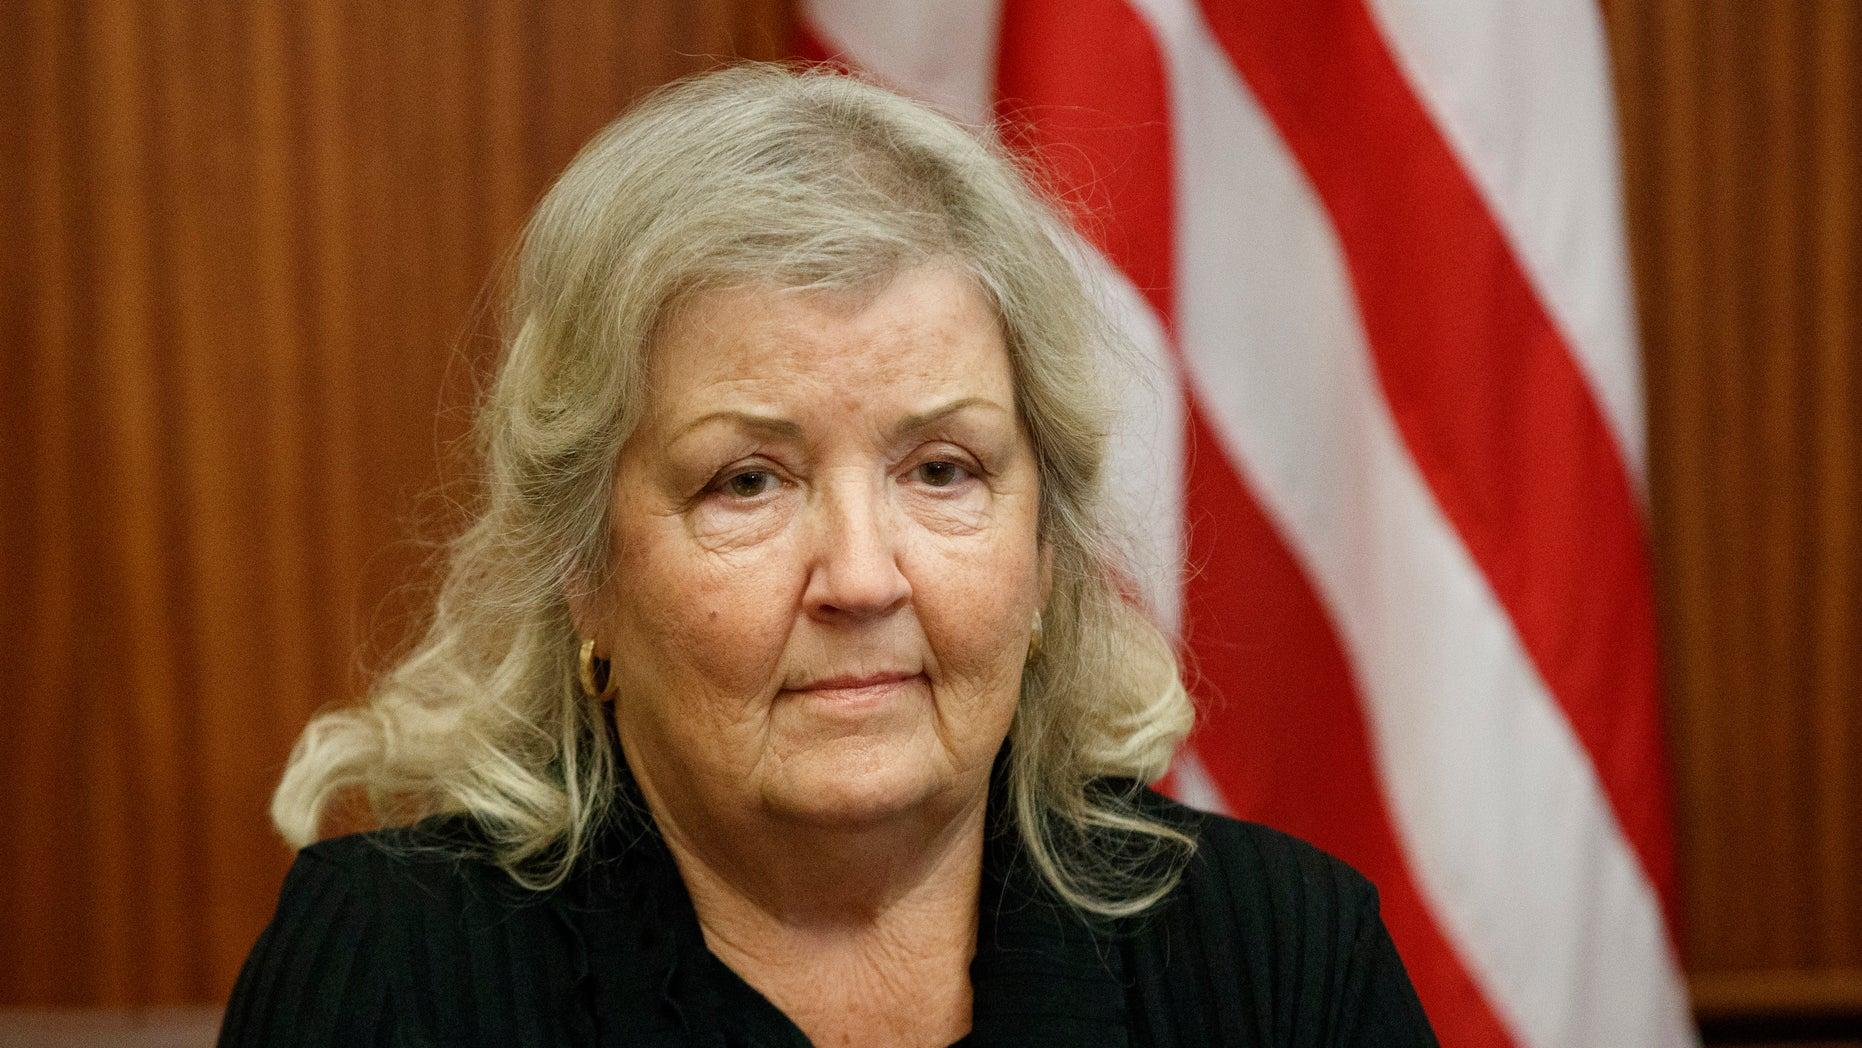 Juanita Broaddrick accused President Bill Clinton of raping her in the 1970s.